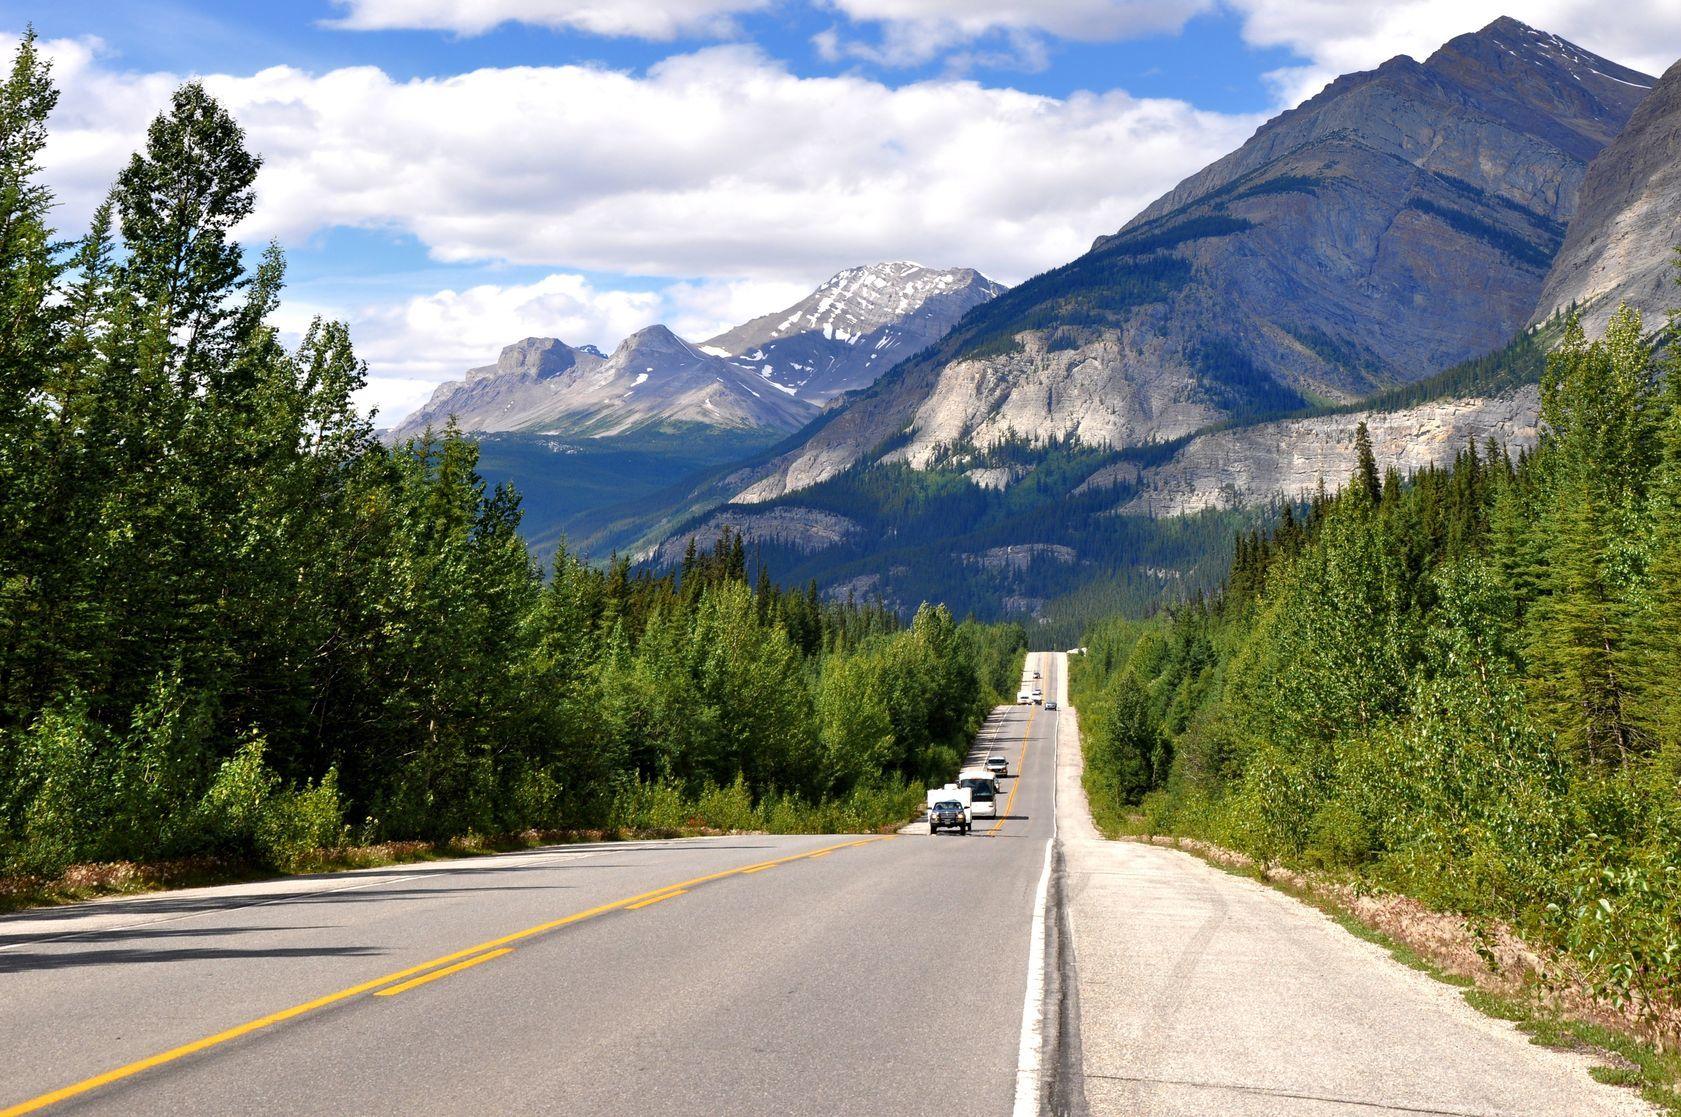 Icefields Parkway | eddygaleott/123RF.com